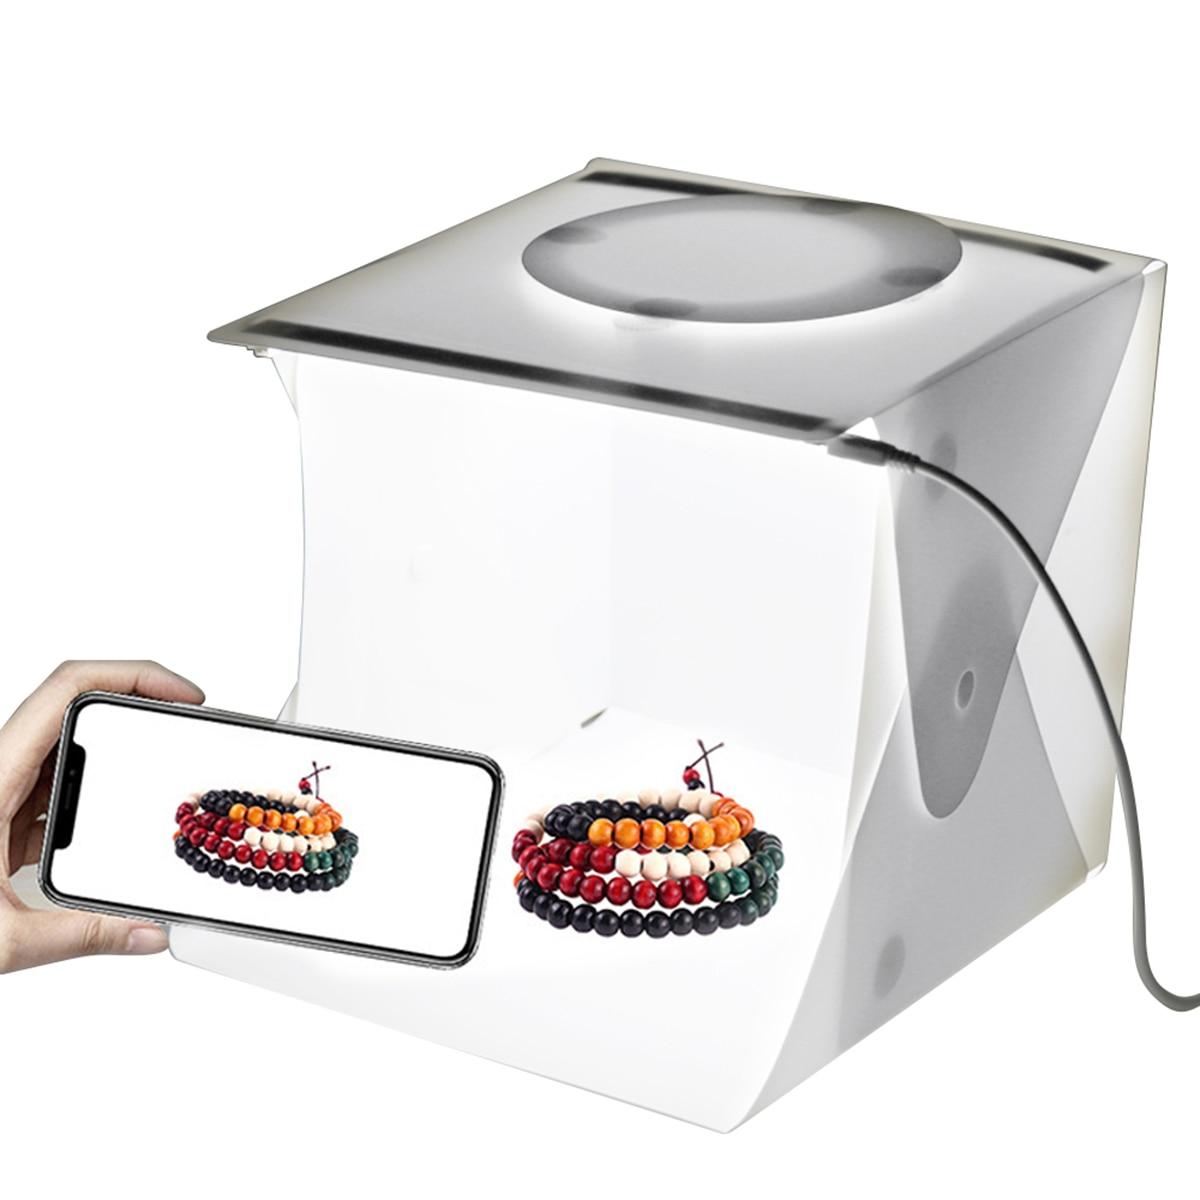 Mini Folding Photography Photo Studio Light Box for DSLR Camera Shooting Tent with Dual LED Strip Lights Photo Softbox Lightbox